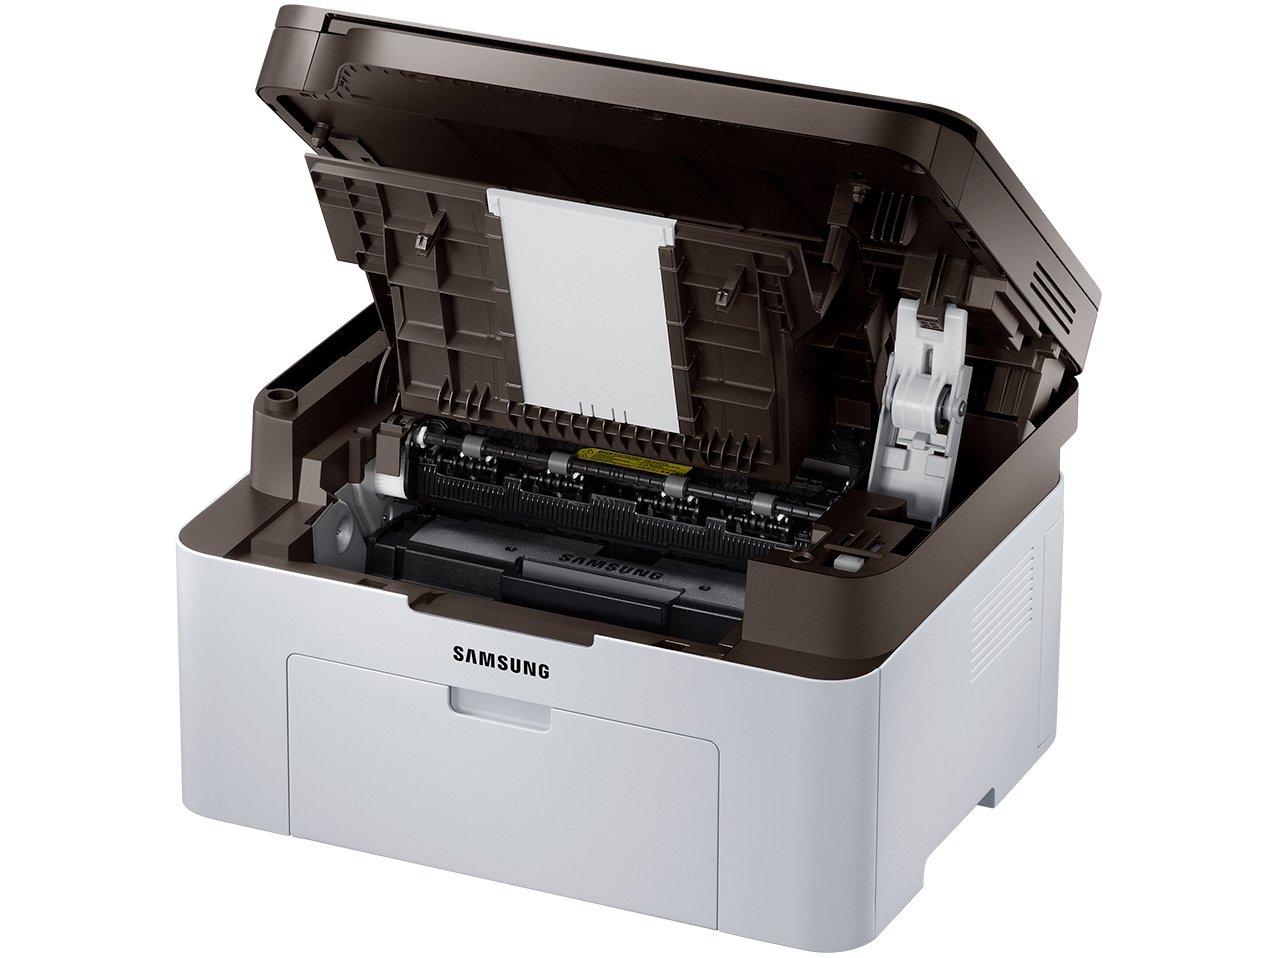 Foto 8 - Multifuncional Samsung Xpress M2070 - Monocromática Laser USB 2.0